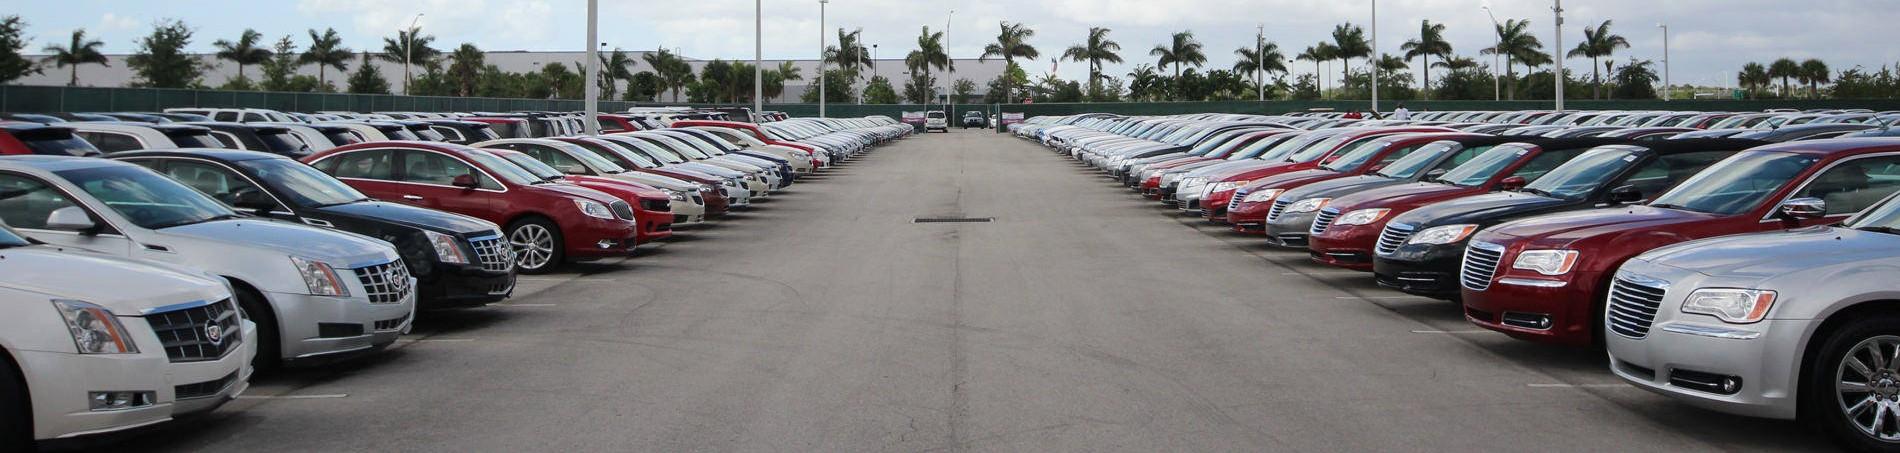 Car Sales Professional